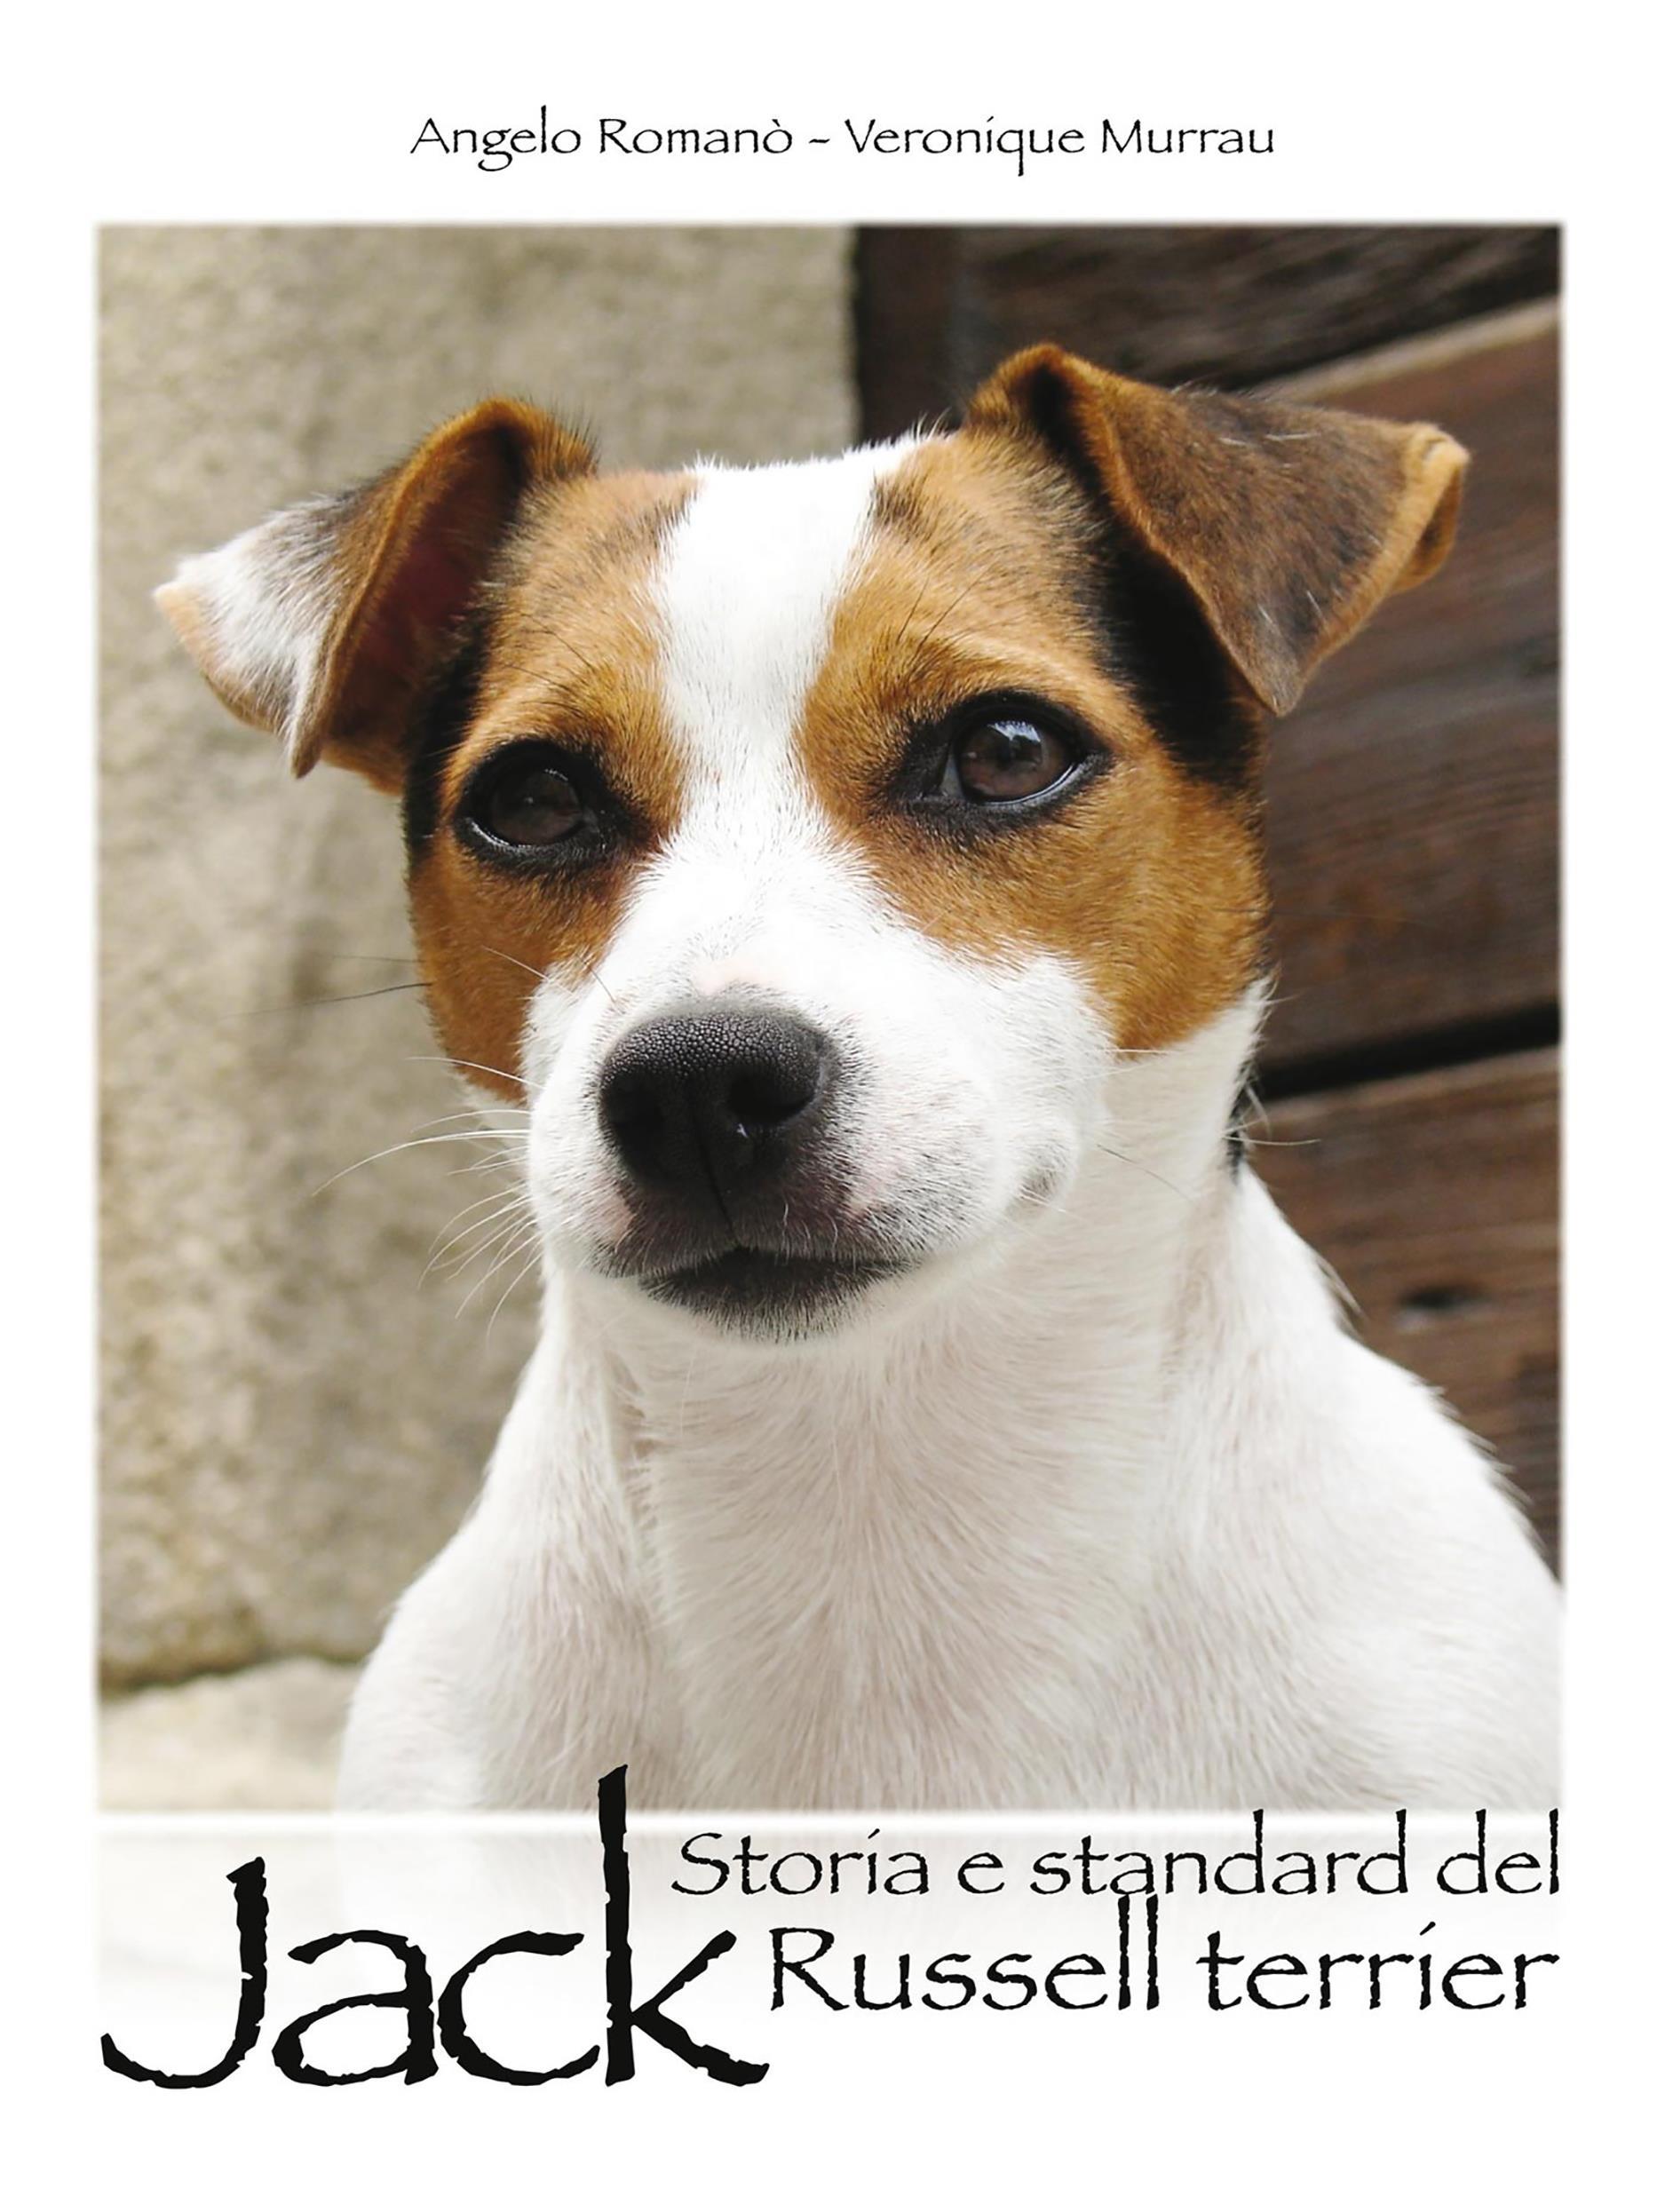 Storia e standard del Jack Russel terrier